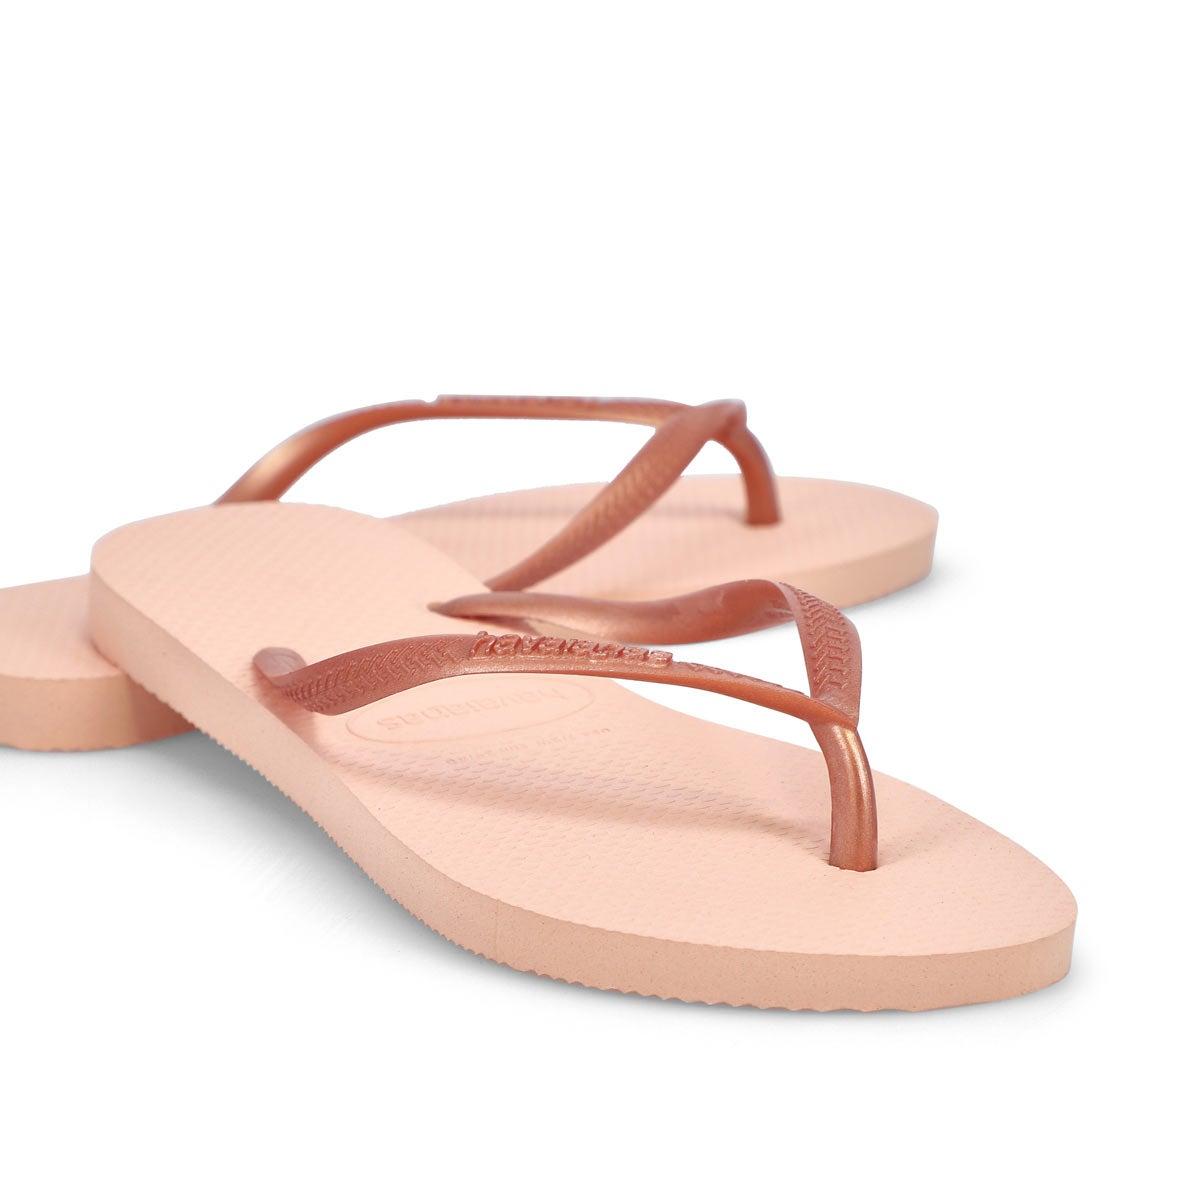 Women's Slim Flip Flops - Ballet Rose